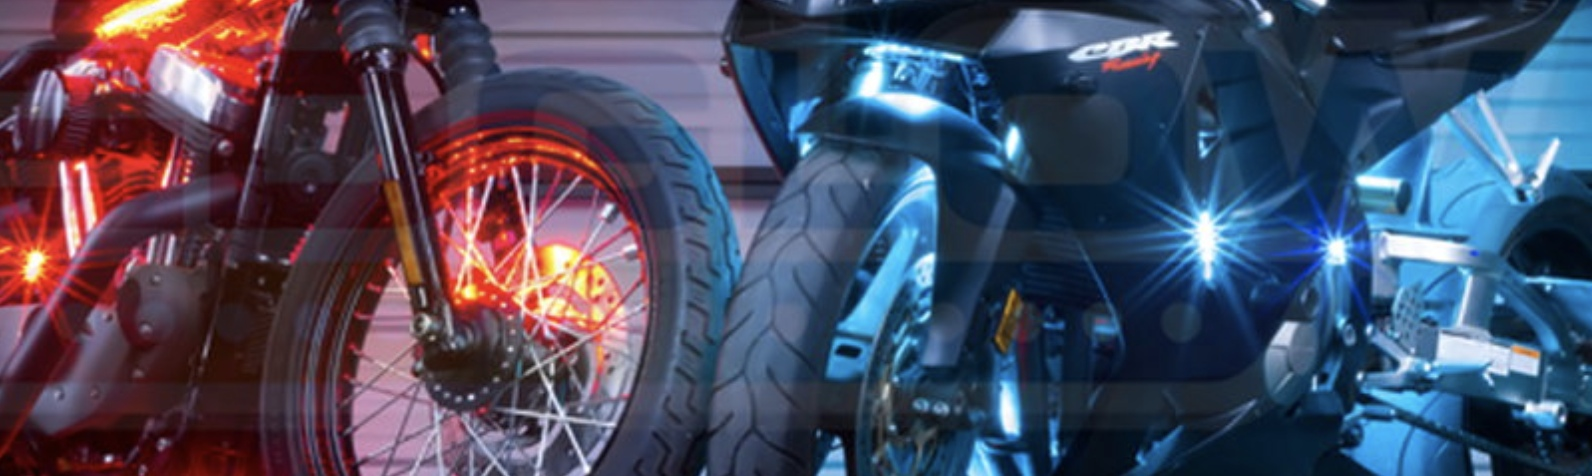 Купить подсветку для мотоцикла